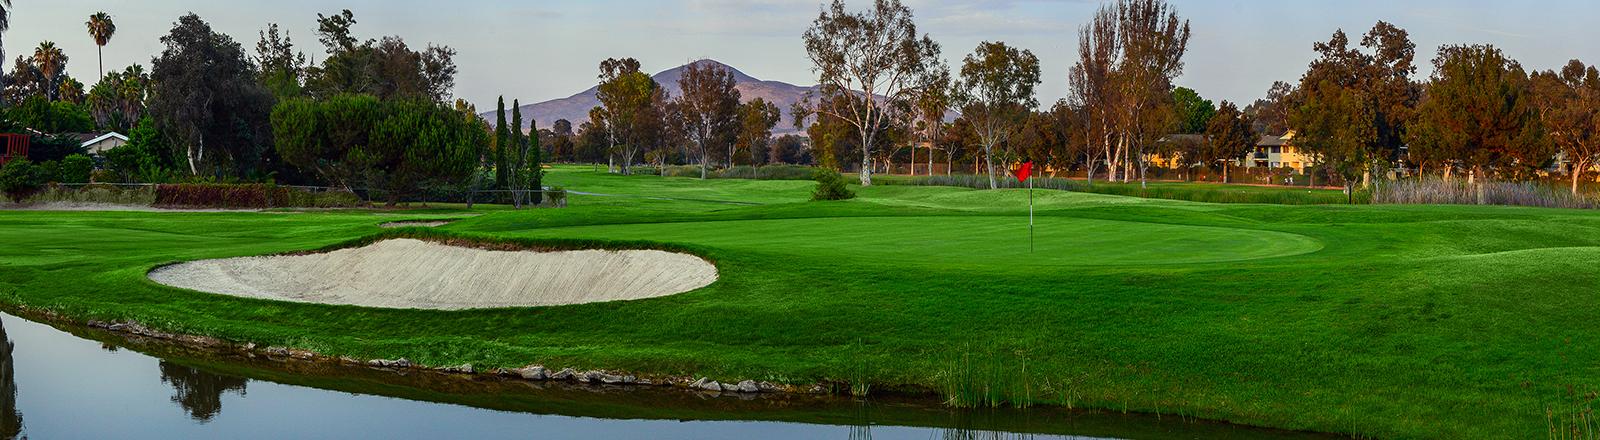 Chula Vista Golf Course Header